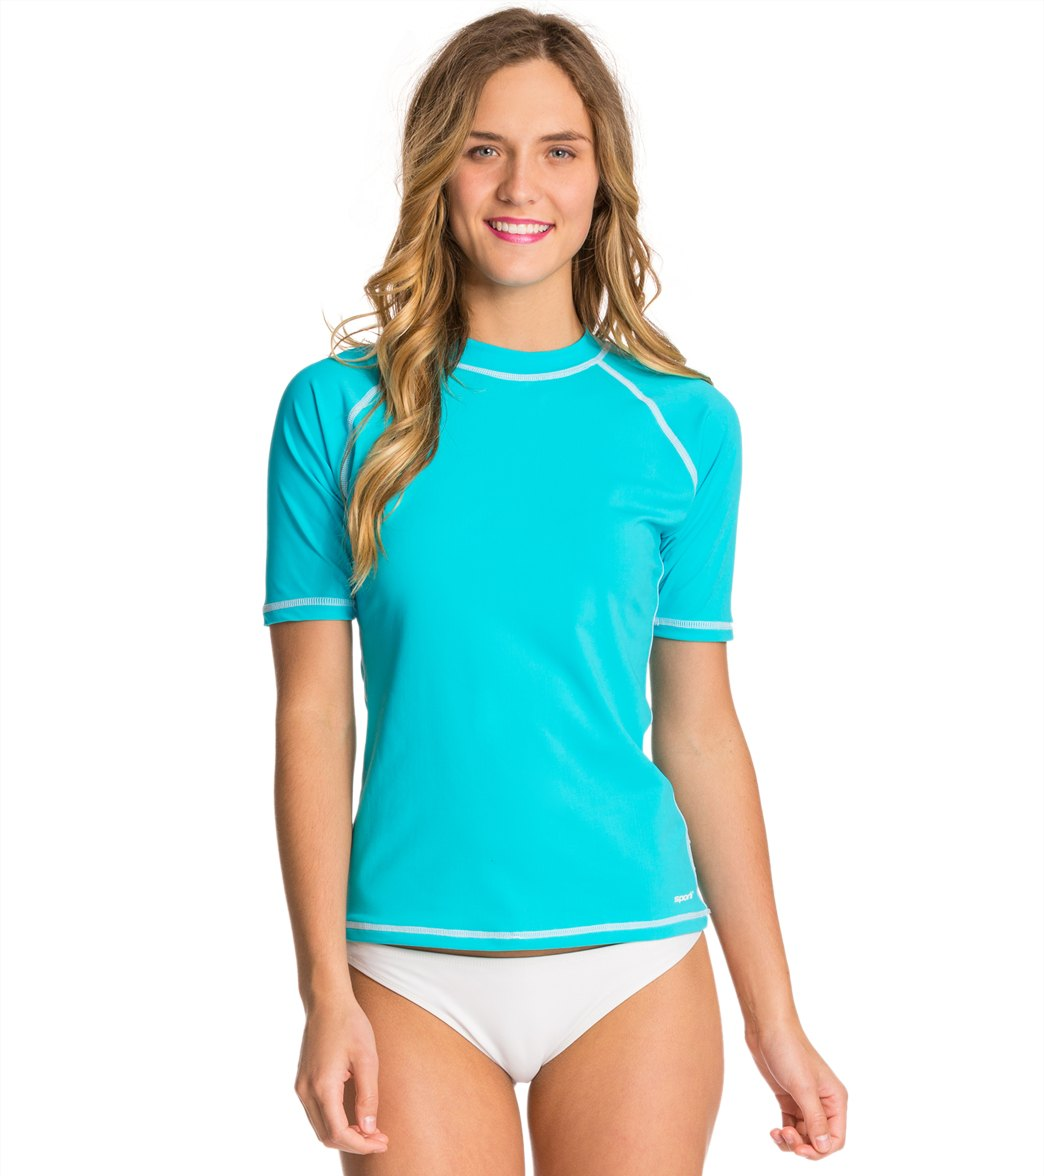 67250657454b6 Sporti Women's S/S UPF 50+ Swim Shirt at SwimOutlet.com